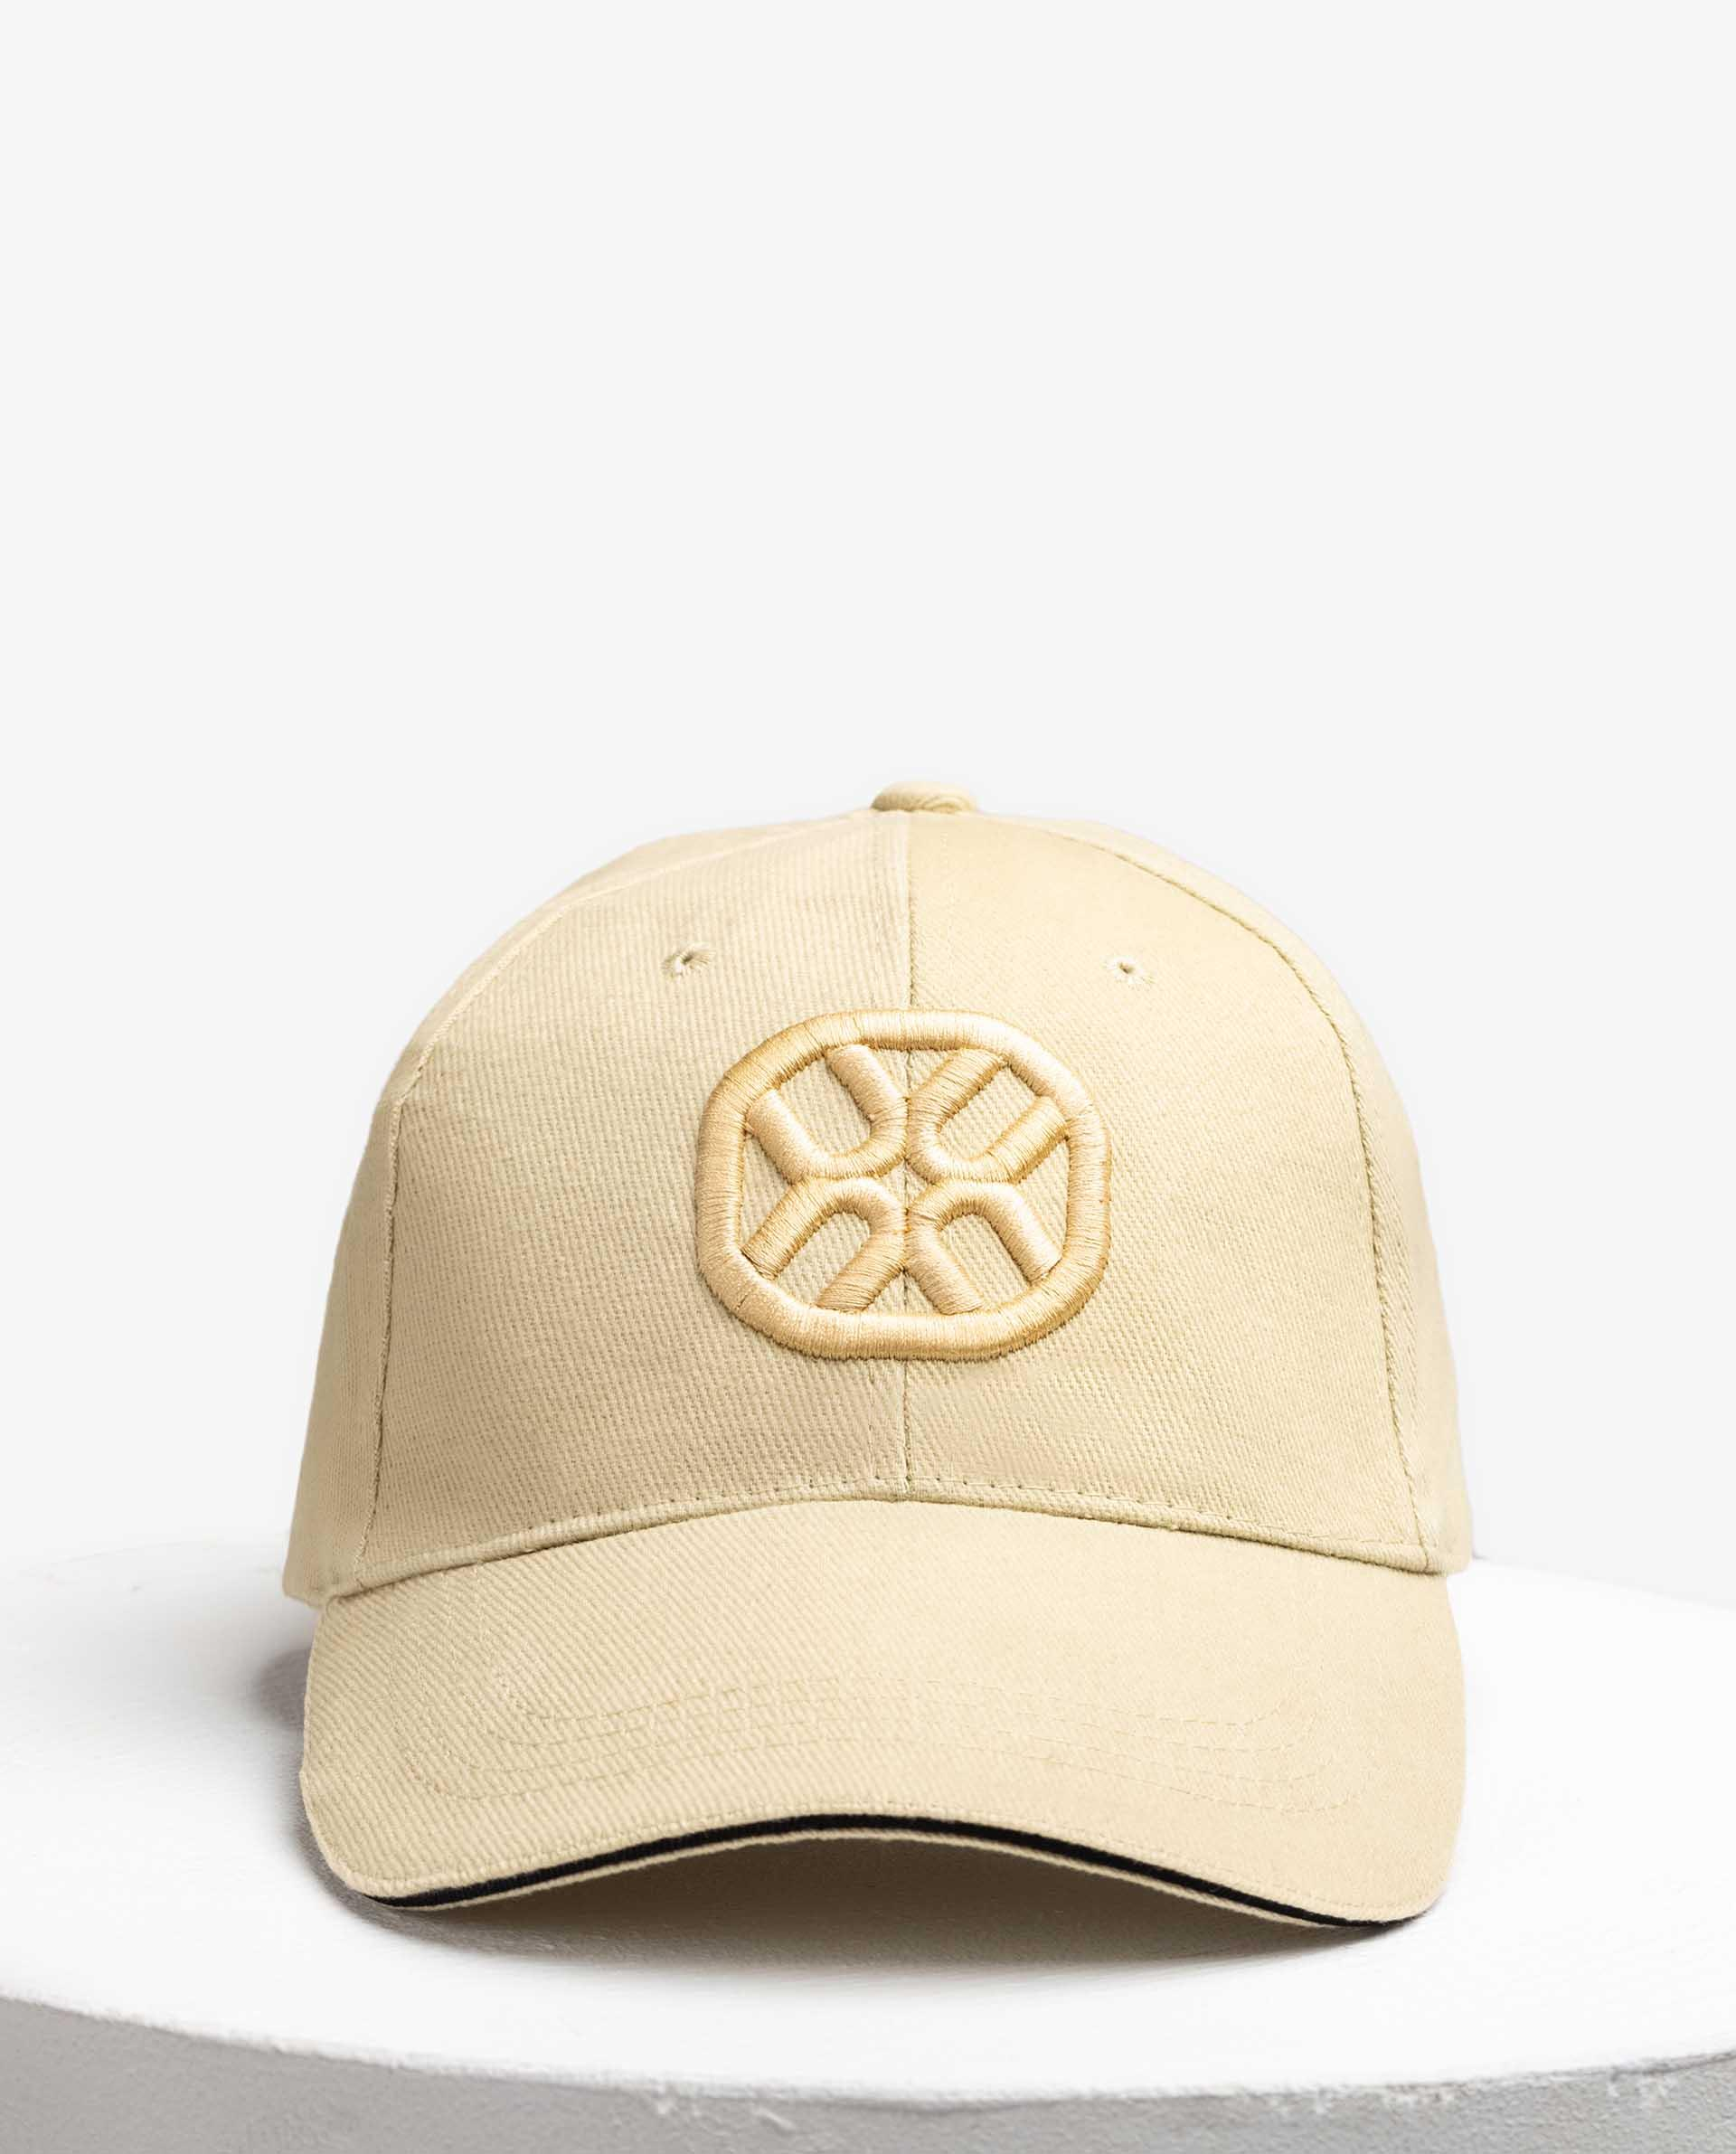 Unisa Gorras y sombreros GORRA_UNI beige 1